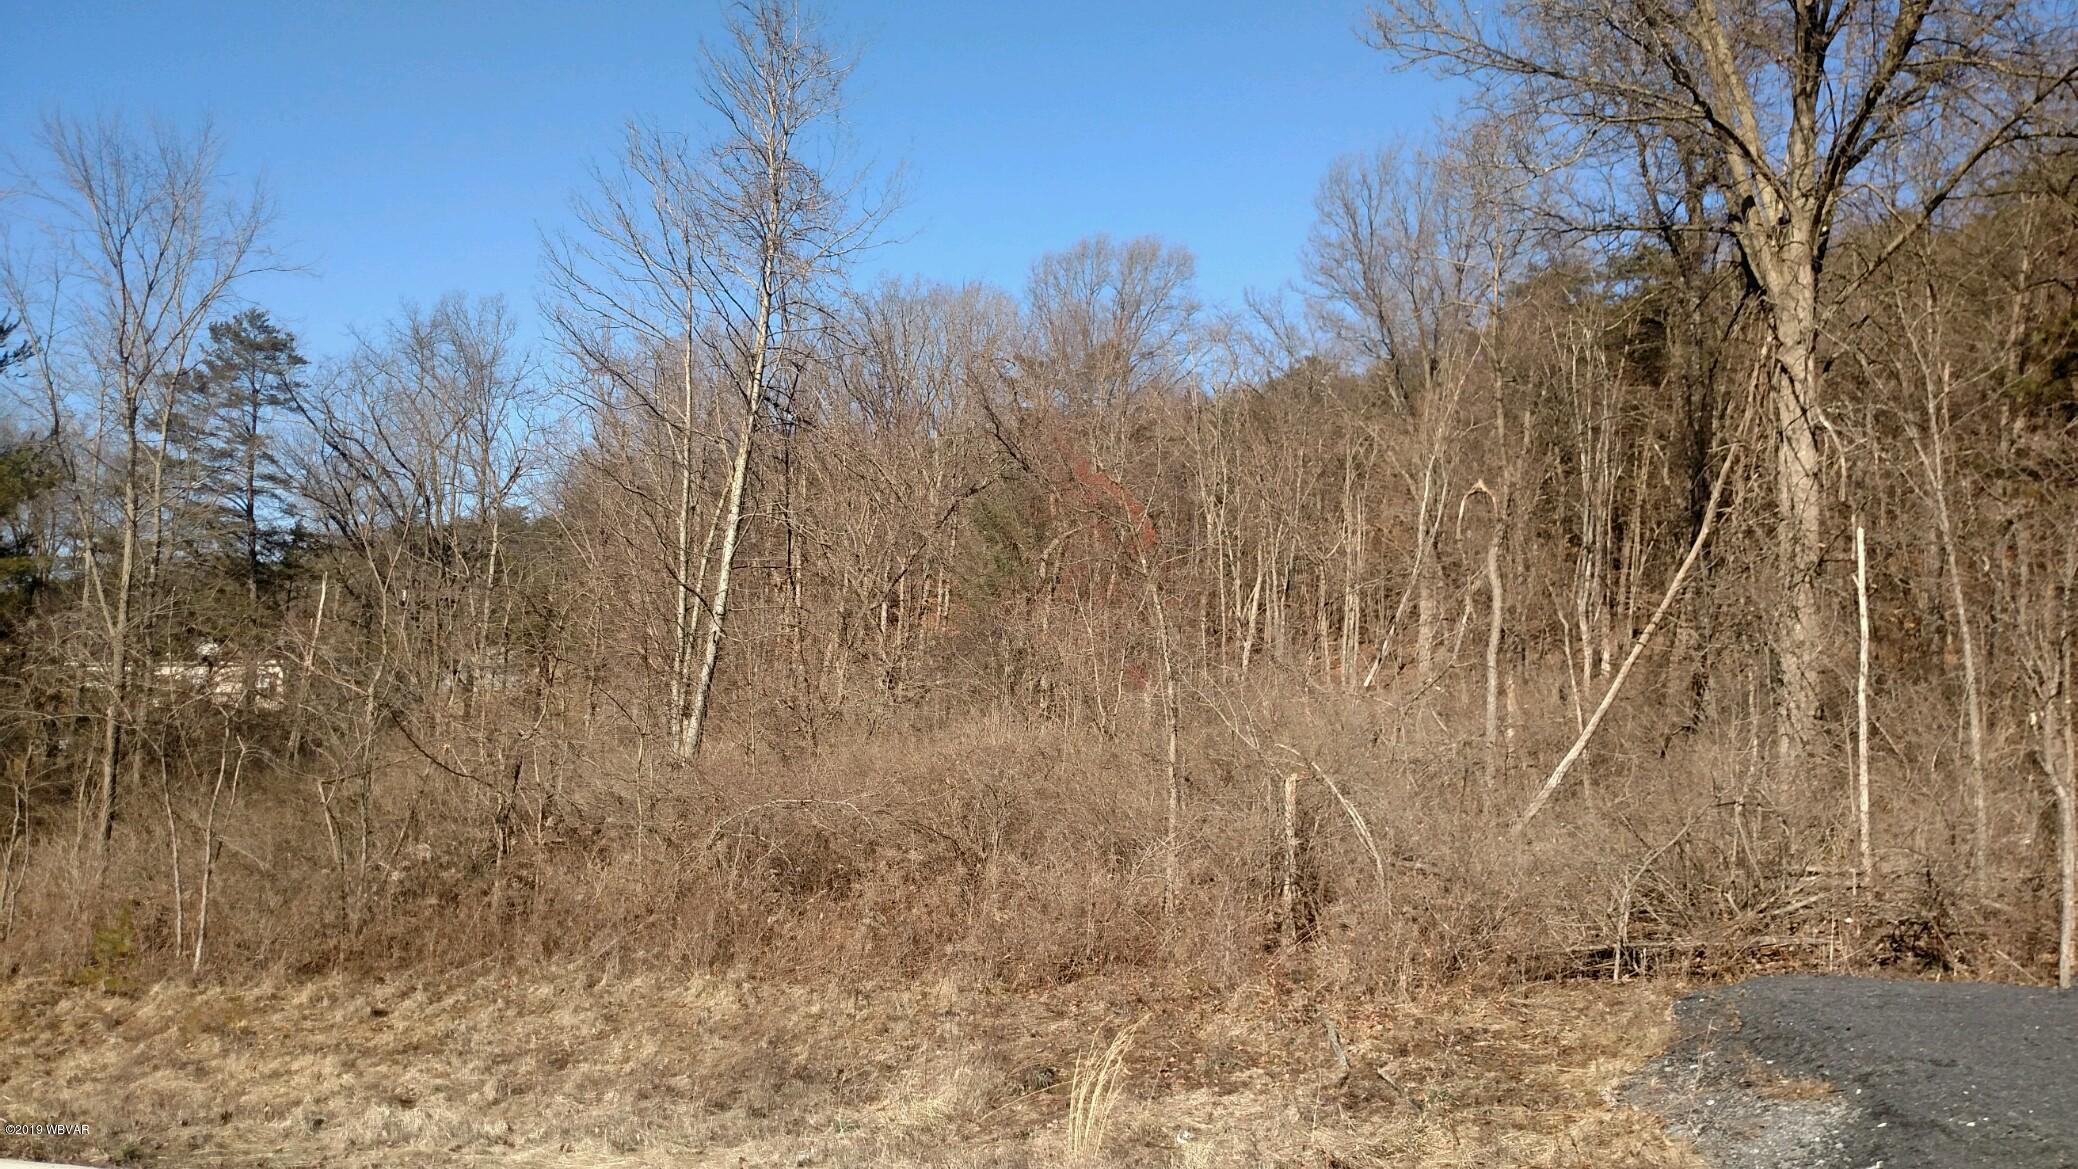 87 CREE DRIVE,Lock Haven,PA 17745,Land,CREE,WB-86398